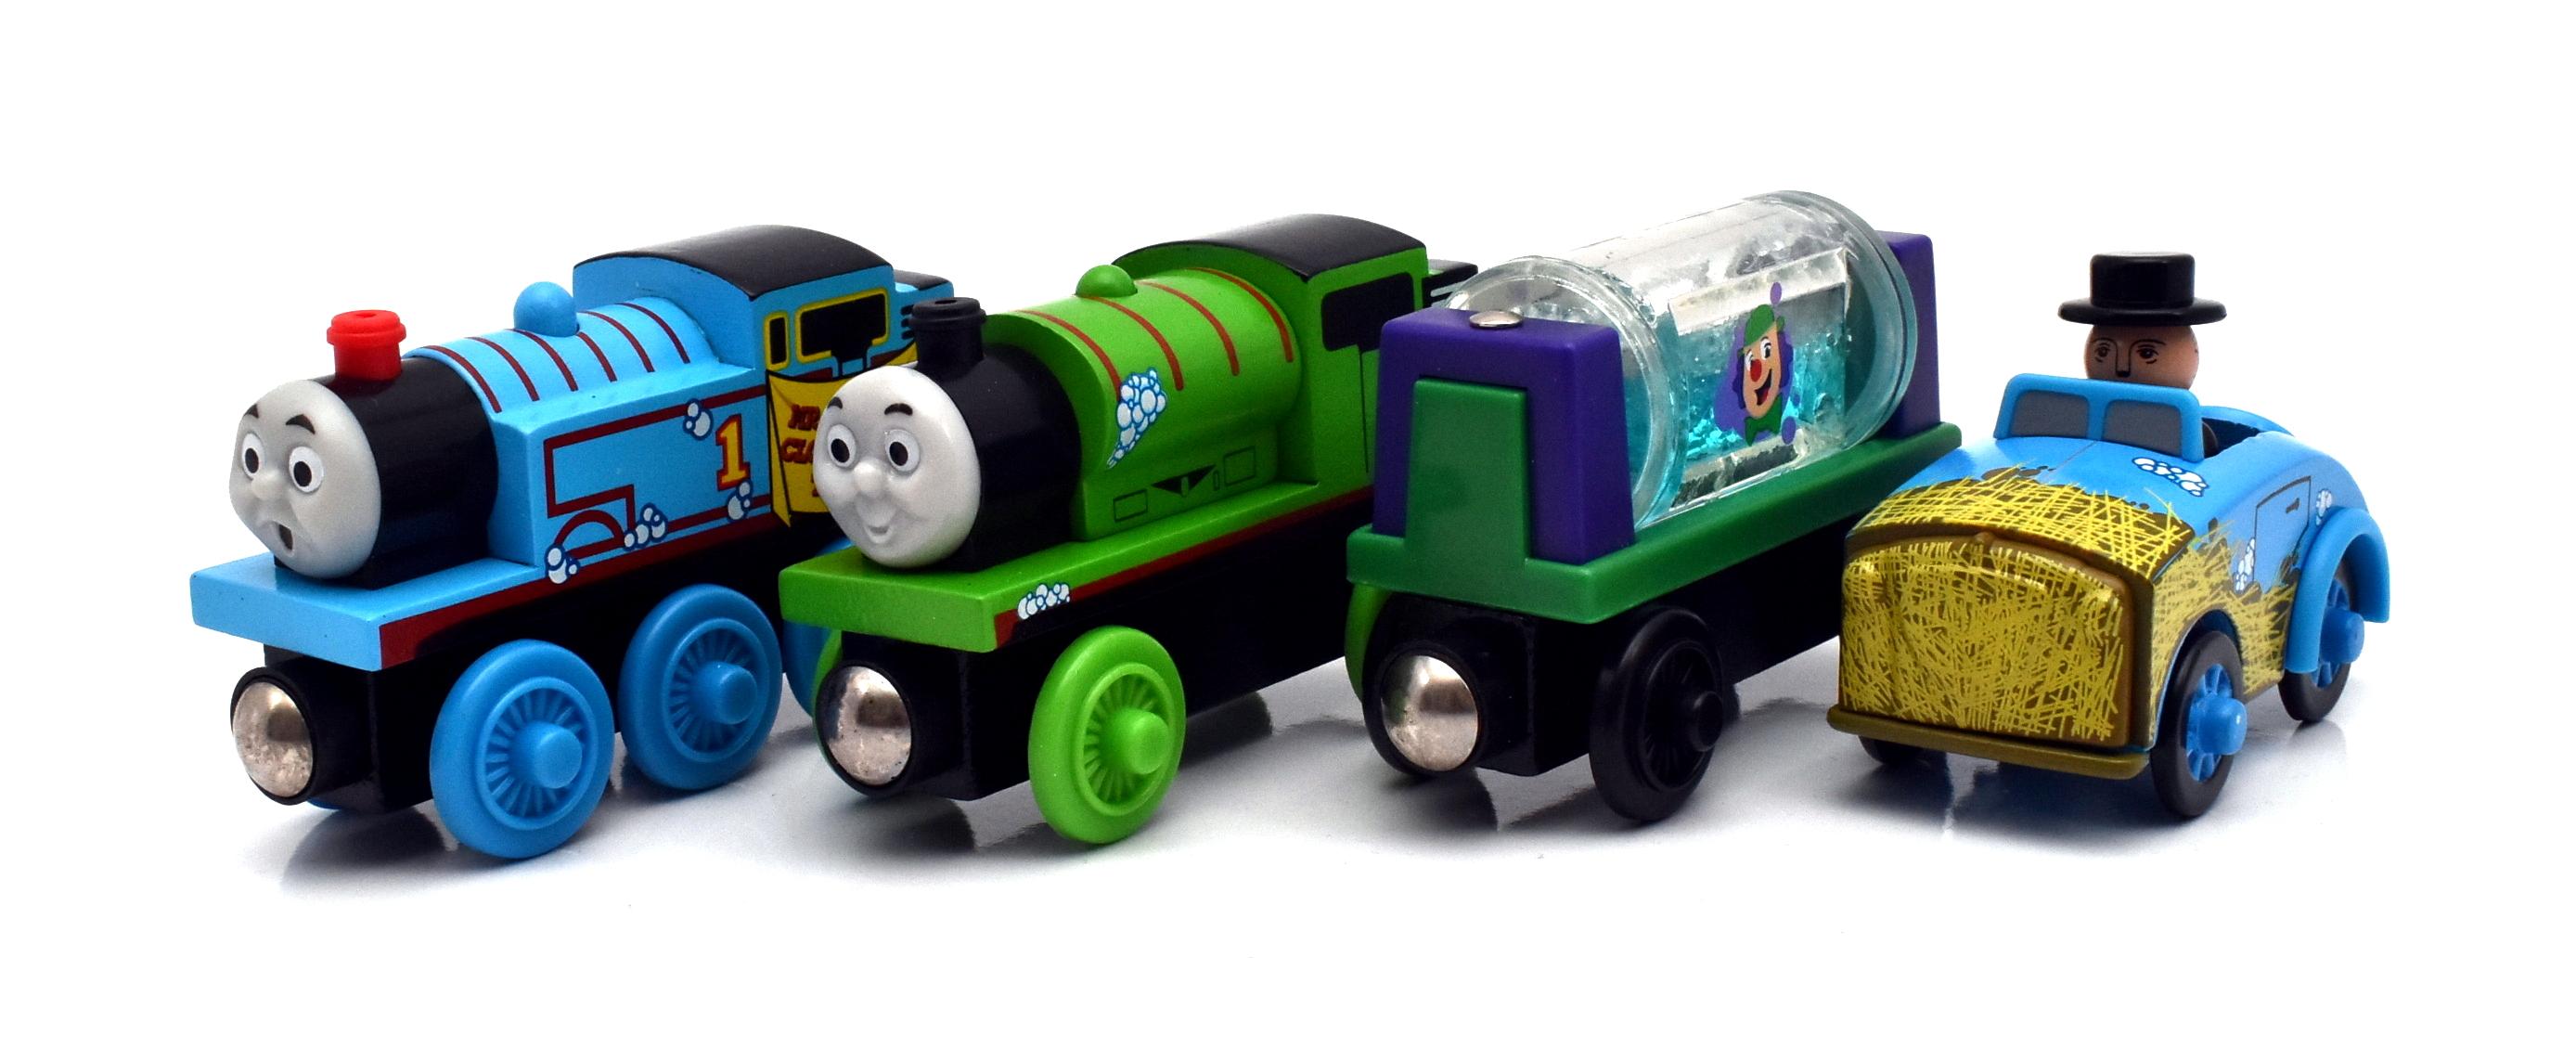 Thomas /& Friends Wooden Railway Slippy Sodor Gift Pack New